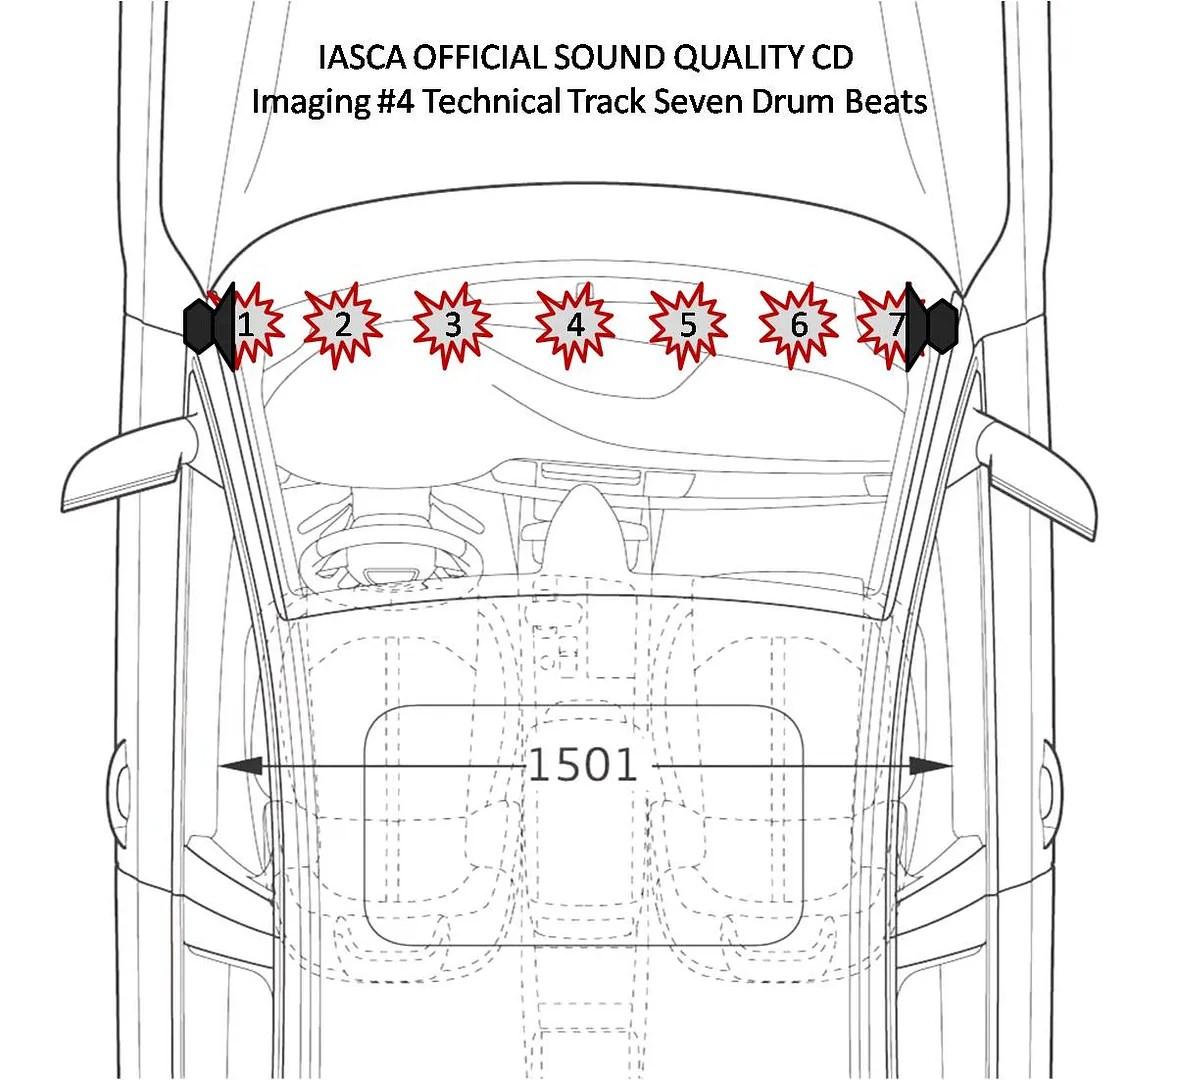 Yaris Sedan Deadening And Sound System